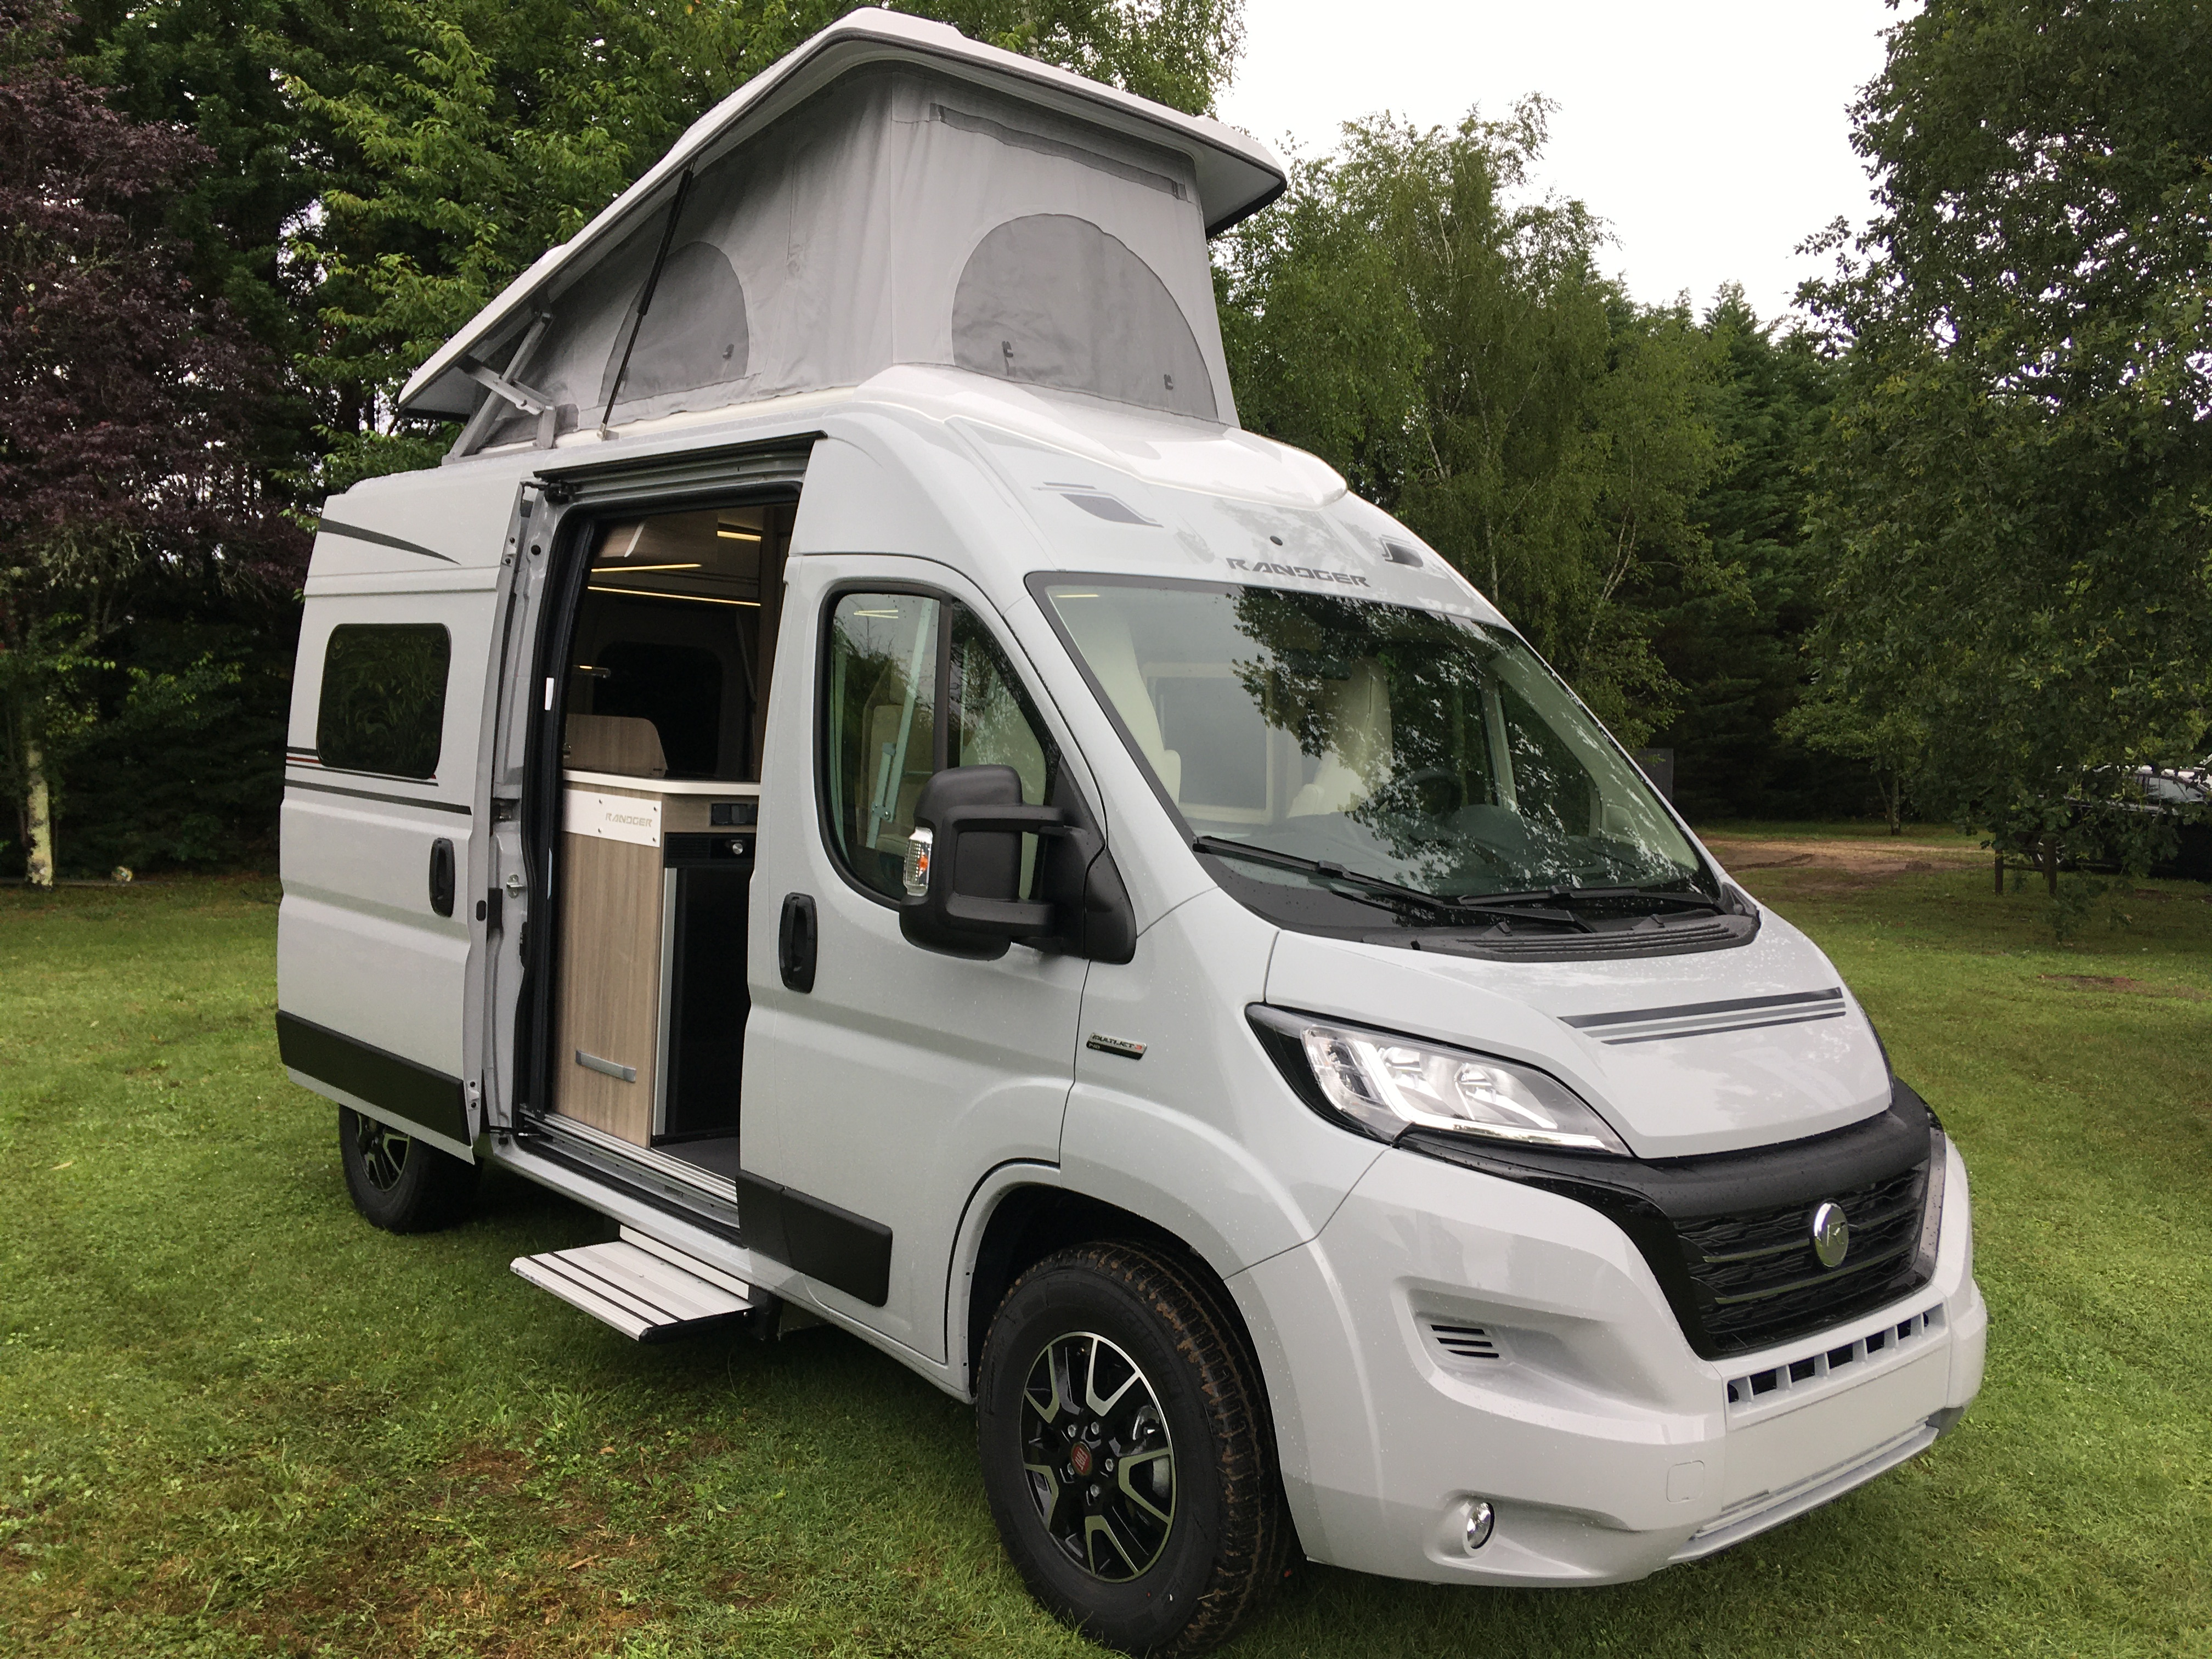 Camping-car RANDGER R540 Pop Up ( en commande)